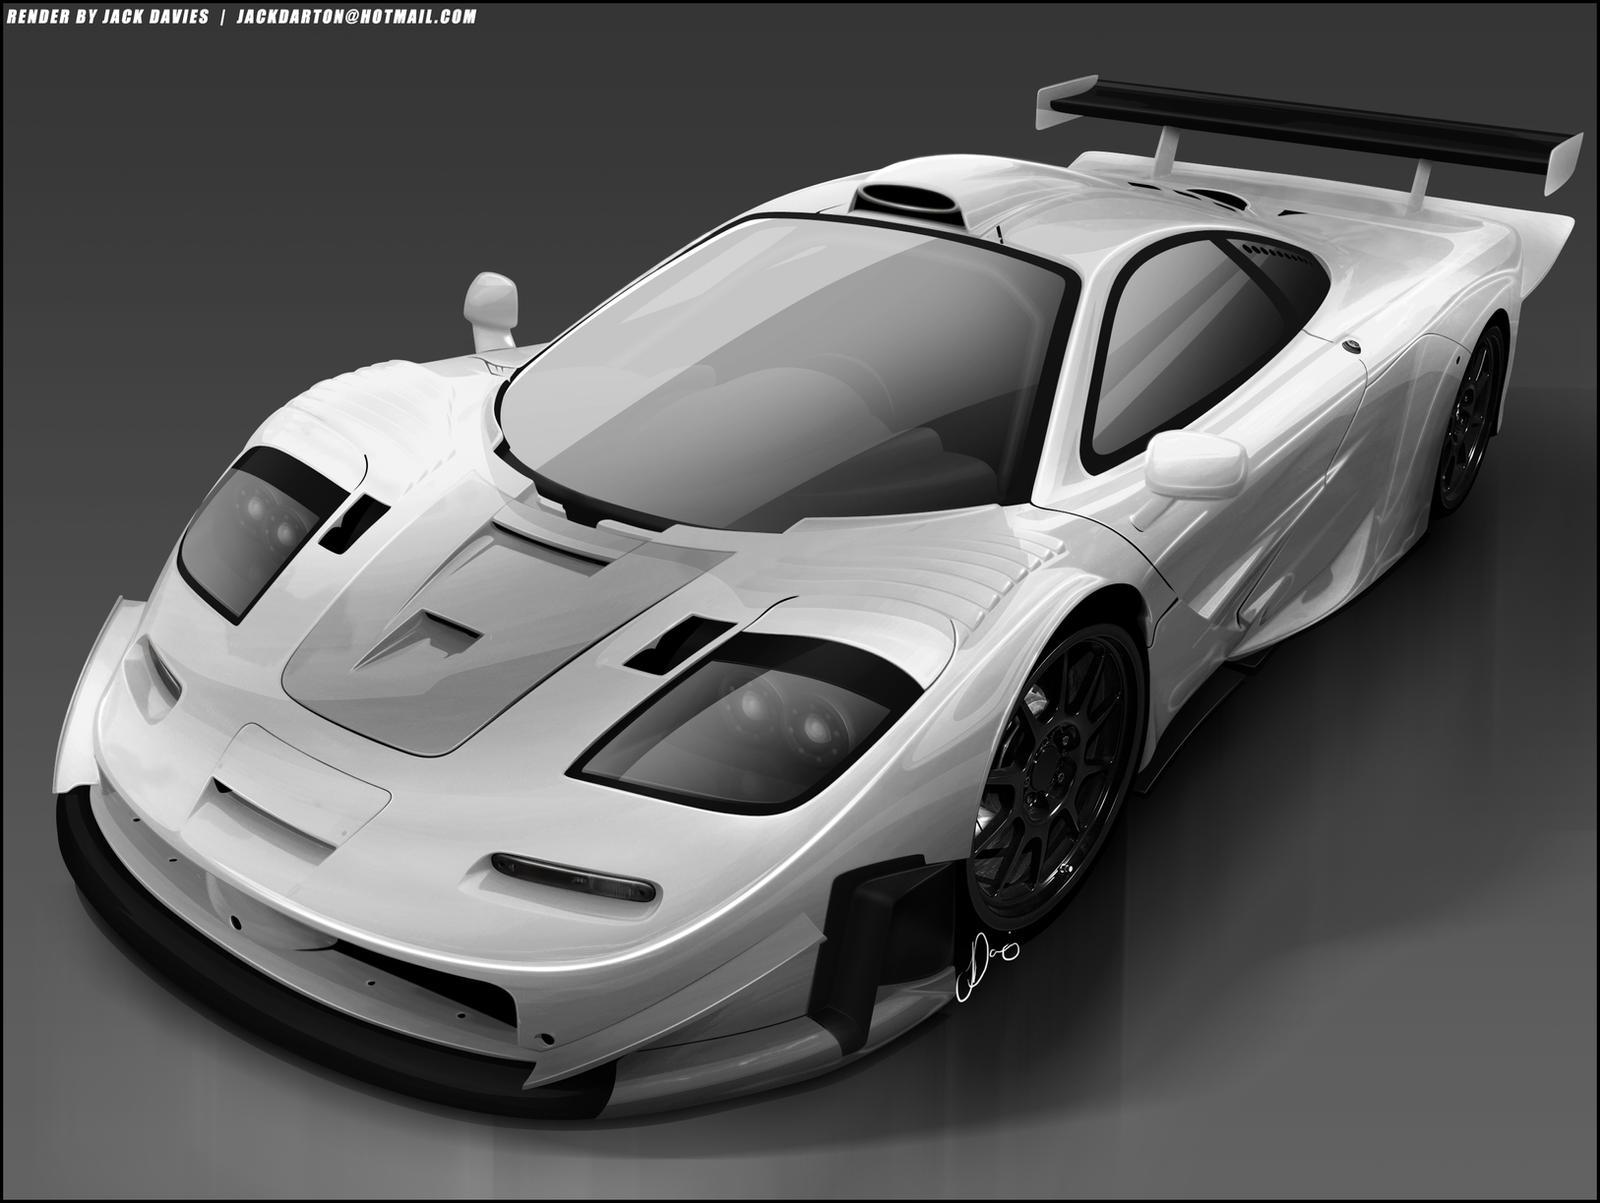 Mclaren F1 GTR Longtail by jackdarton